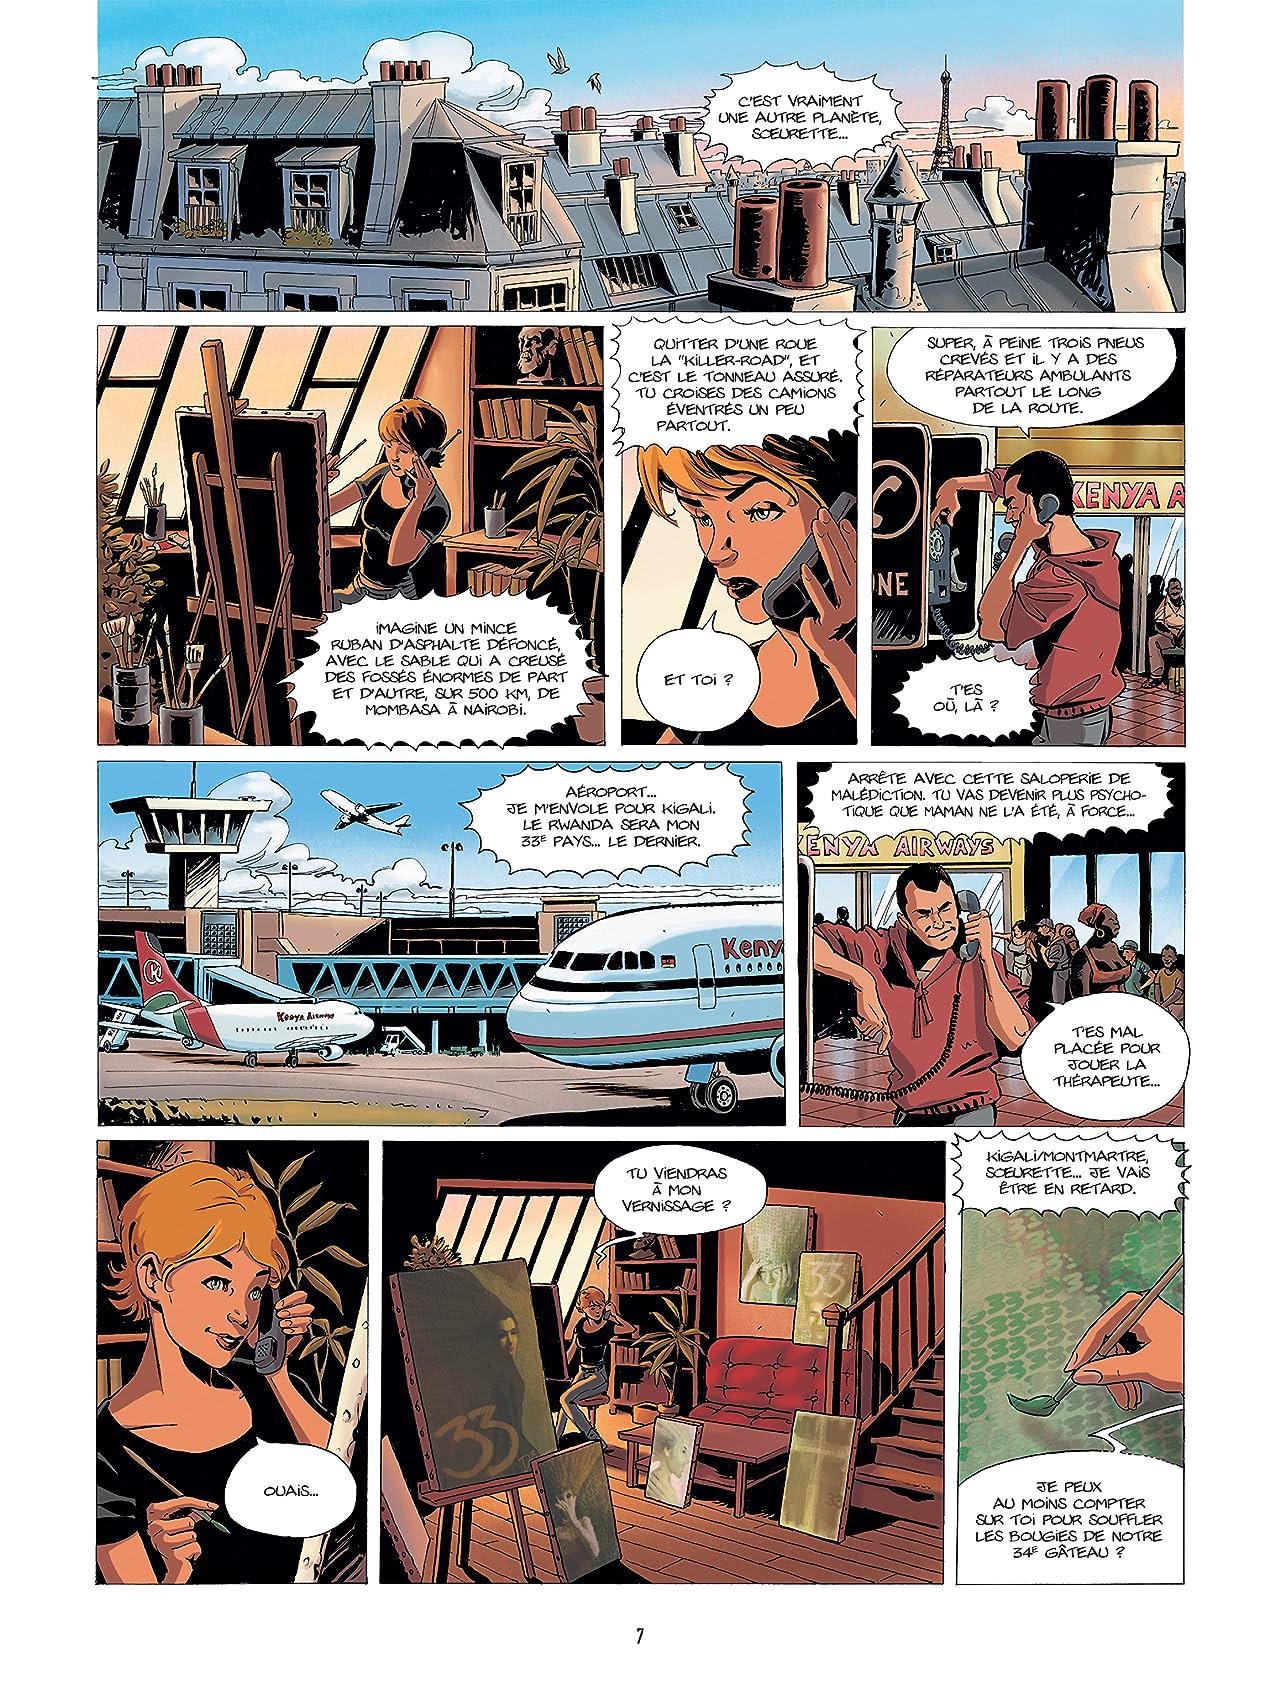 La Lignée Vol. 4: Diane & David,  1994